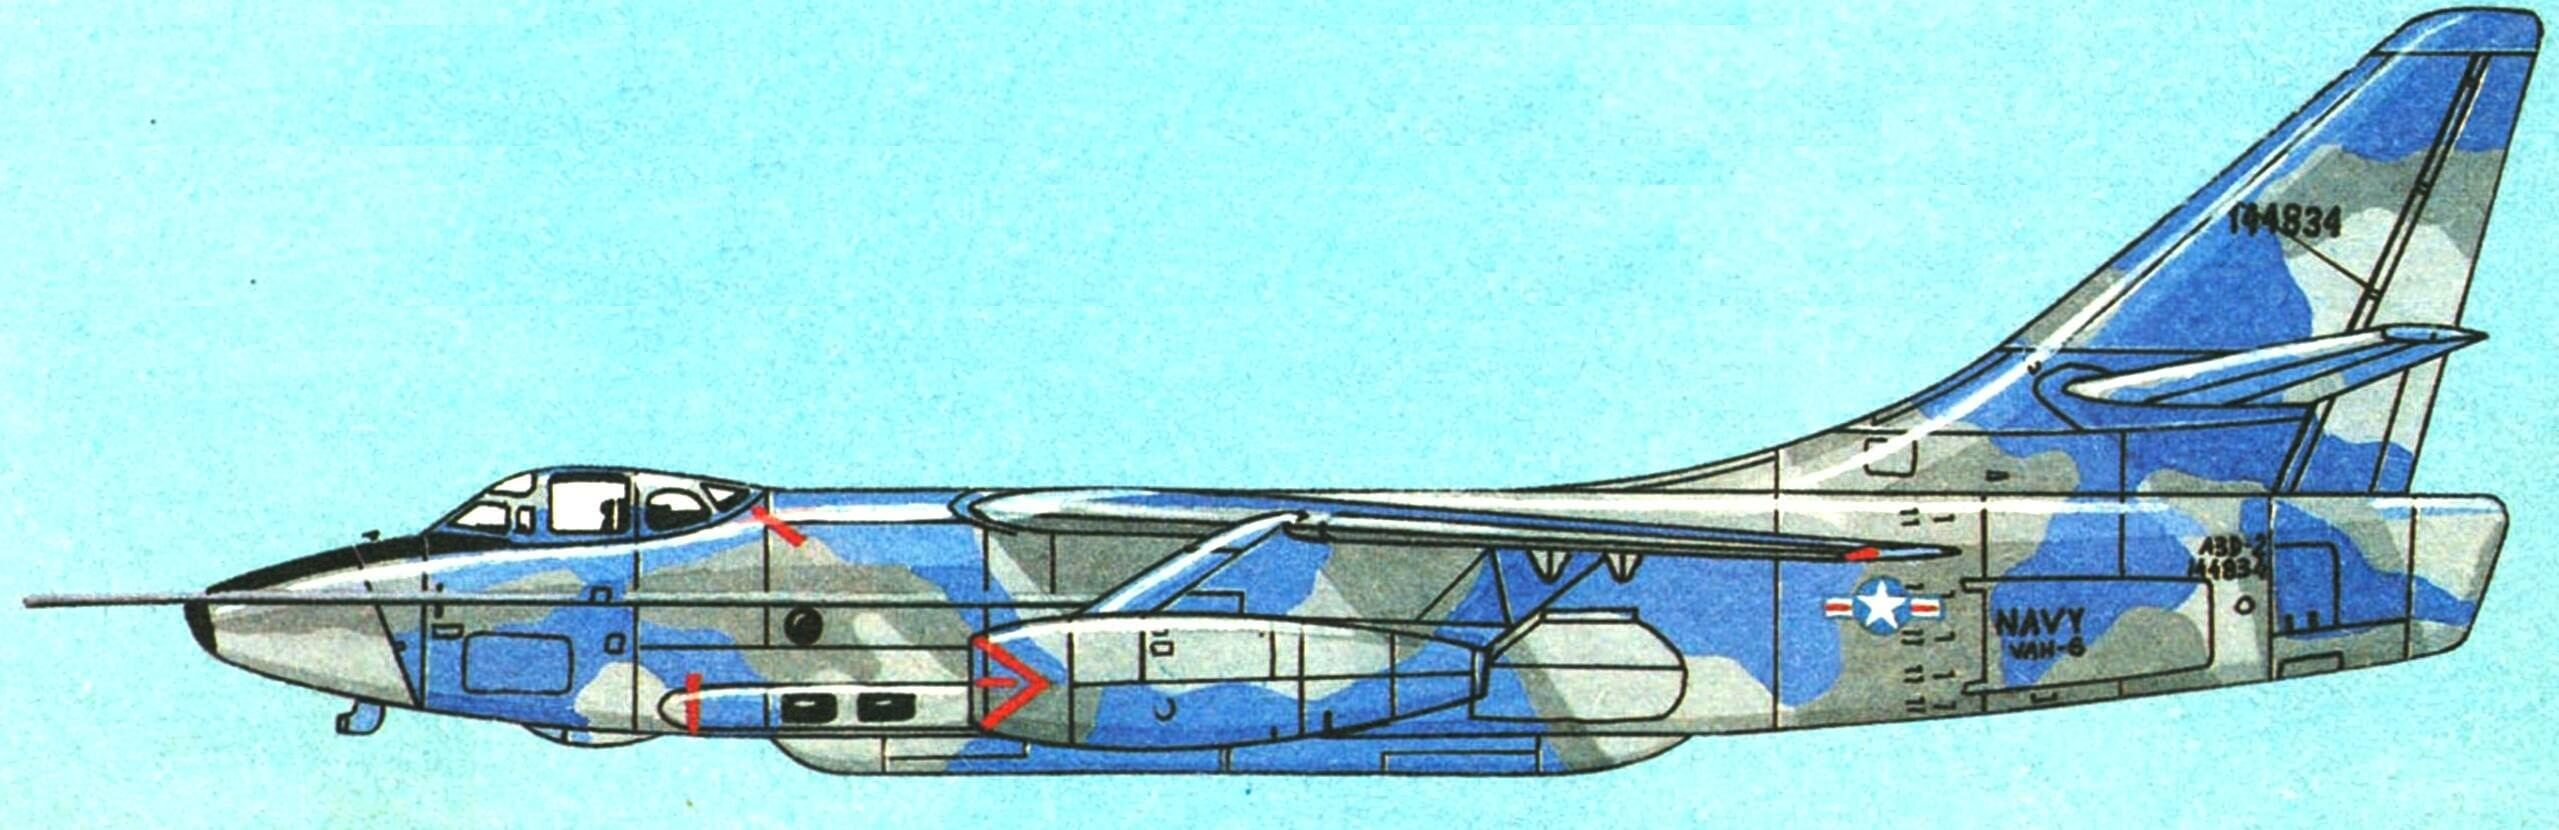 ЕА-3В модификация разведчика RA-3B с РЛС бокового обзора.